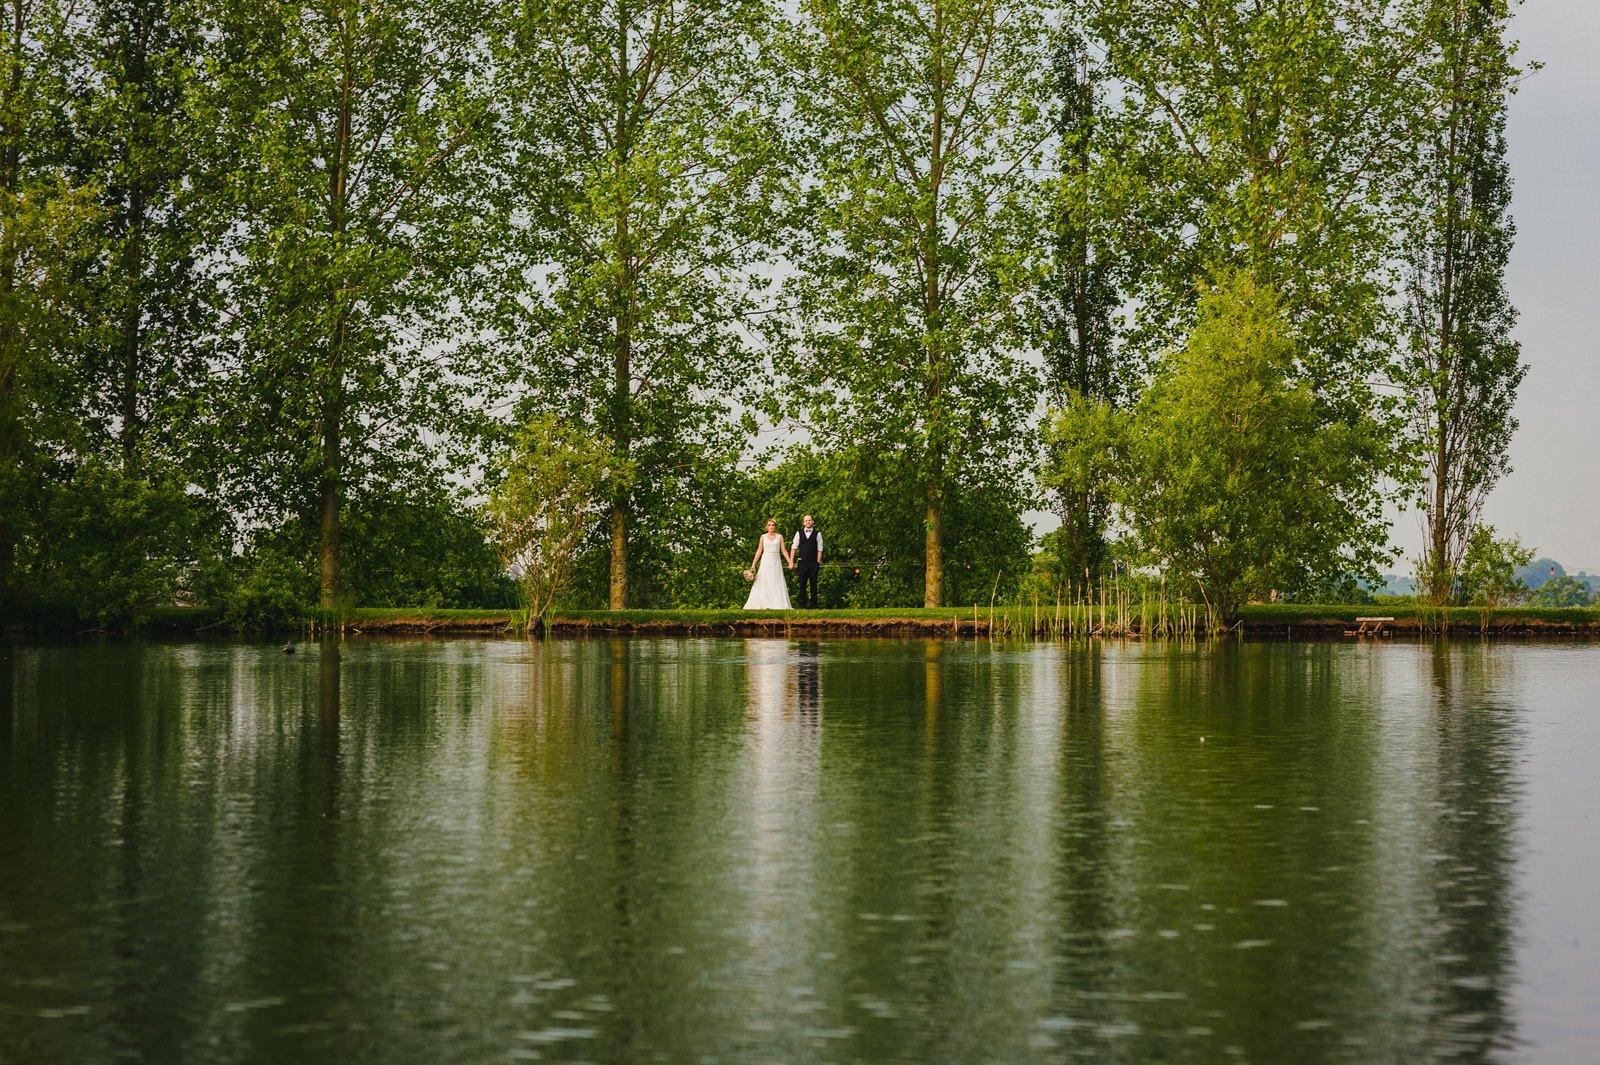 Millers Of Netley wedding, Dorrington, Shrewsbury | Emma + Ben 82